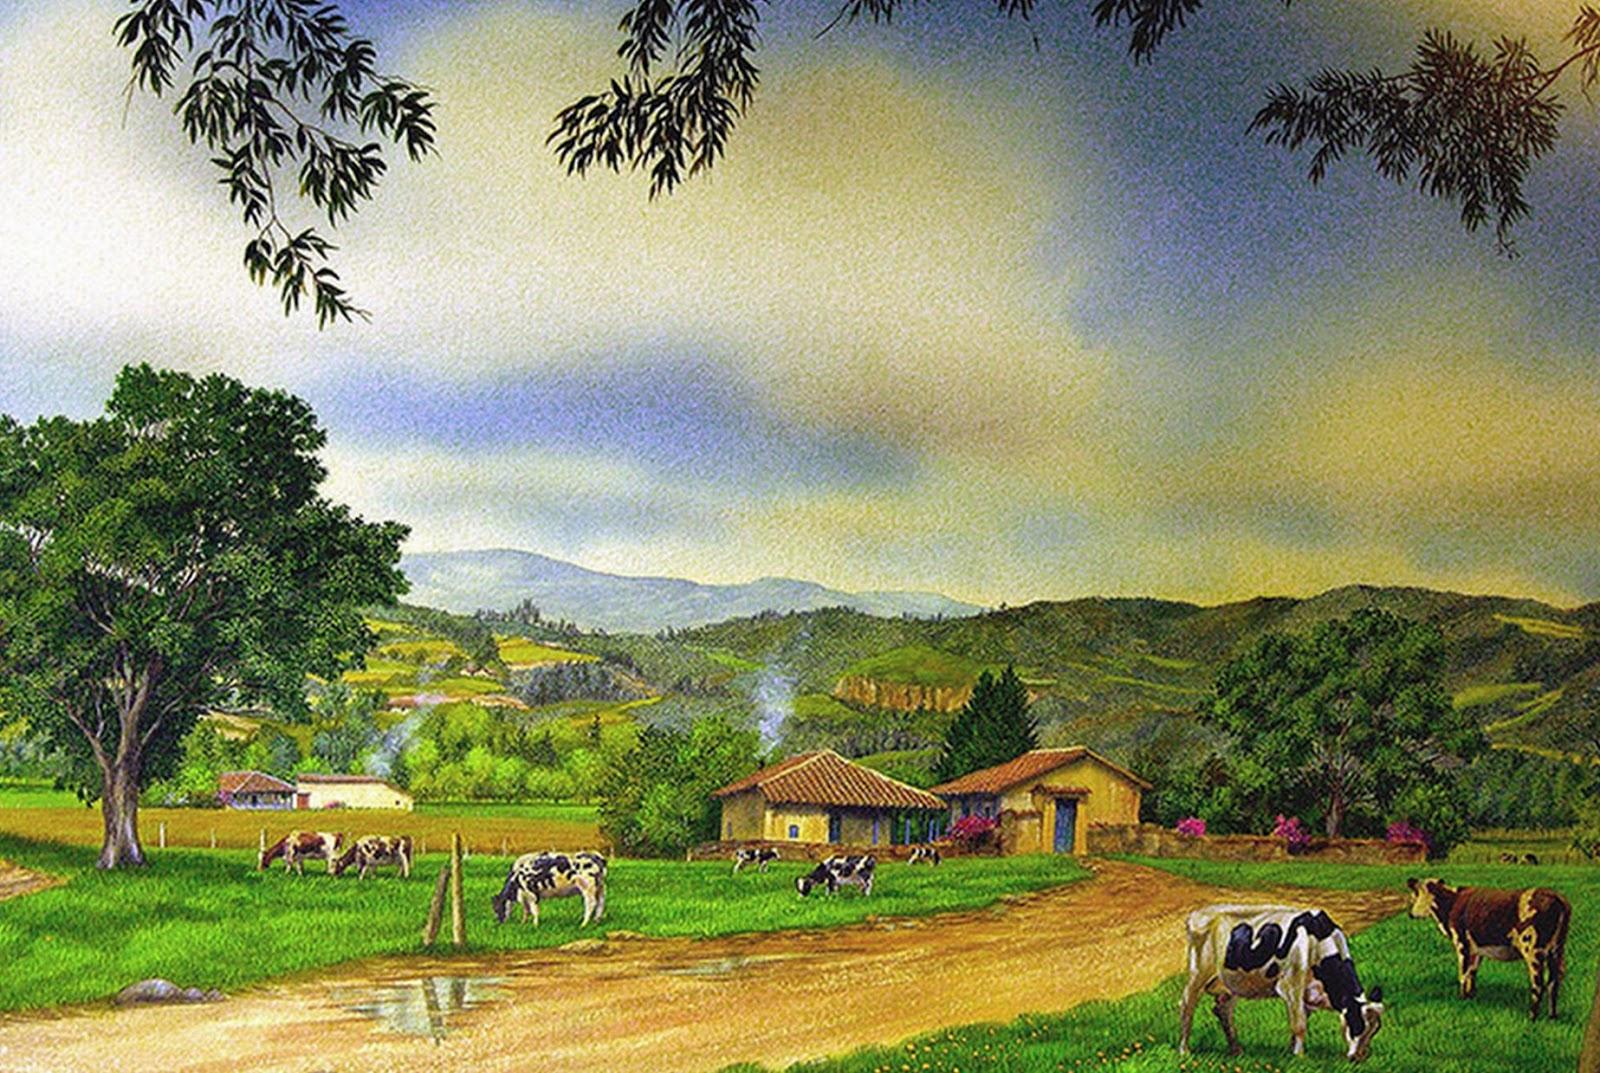 Imágenes Arte Pinturas: Pinturas Paisajes Campesinos, José Orlando López